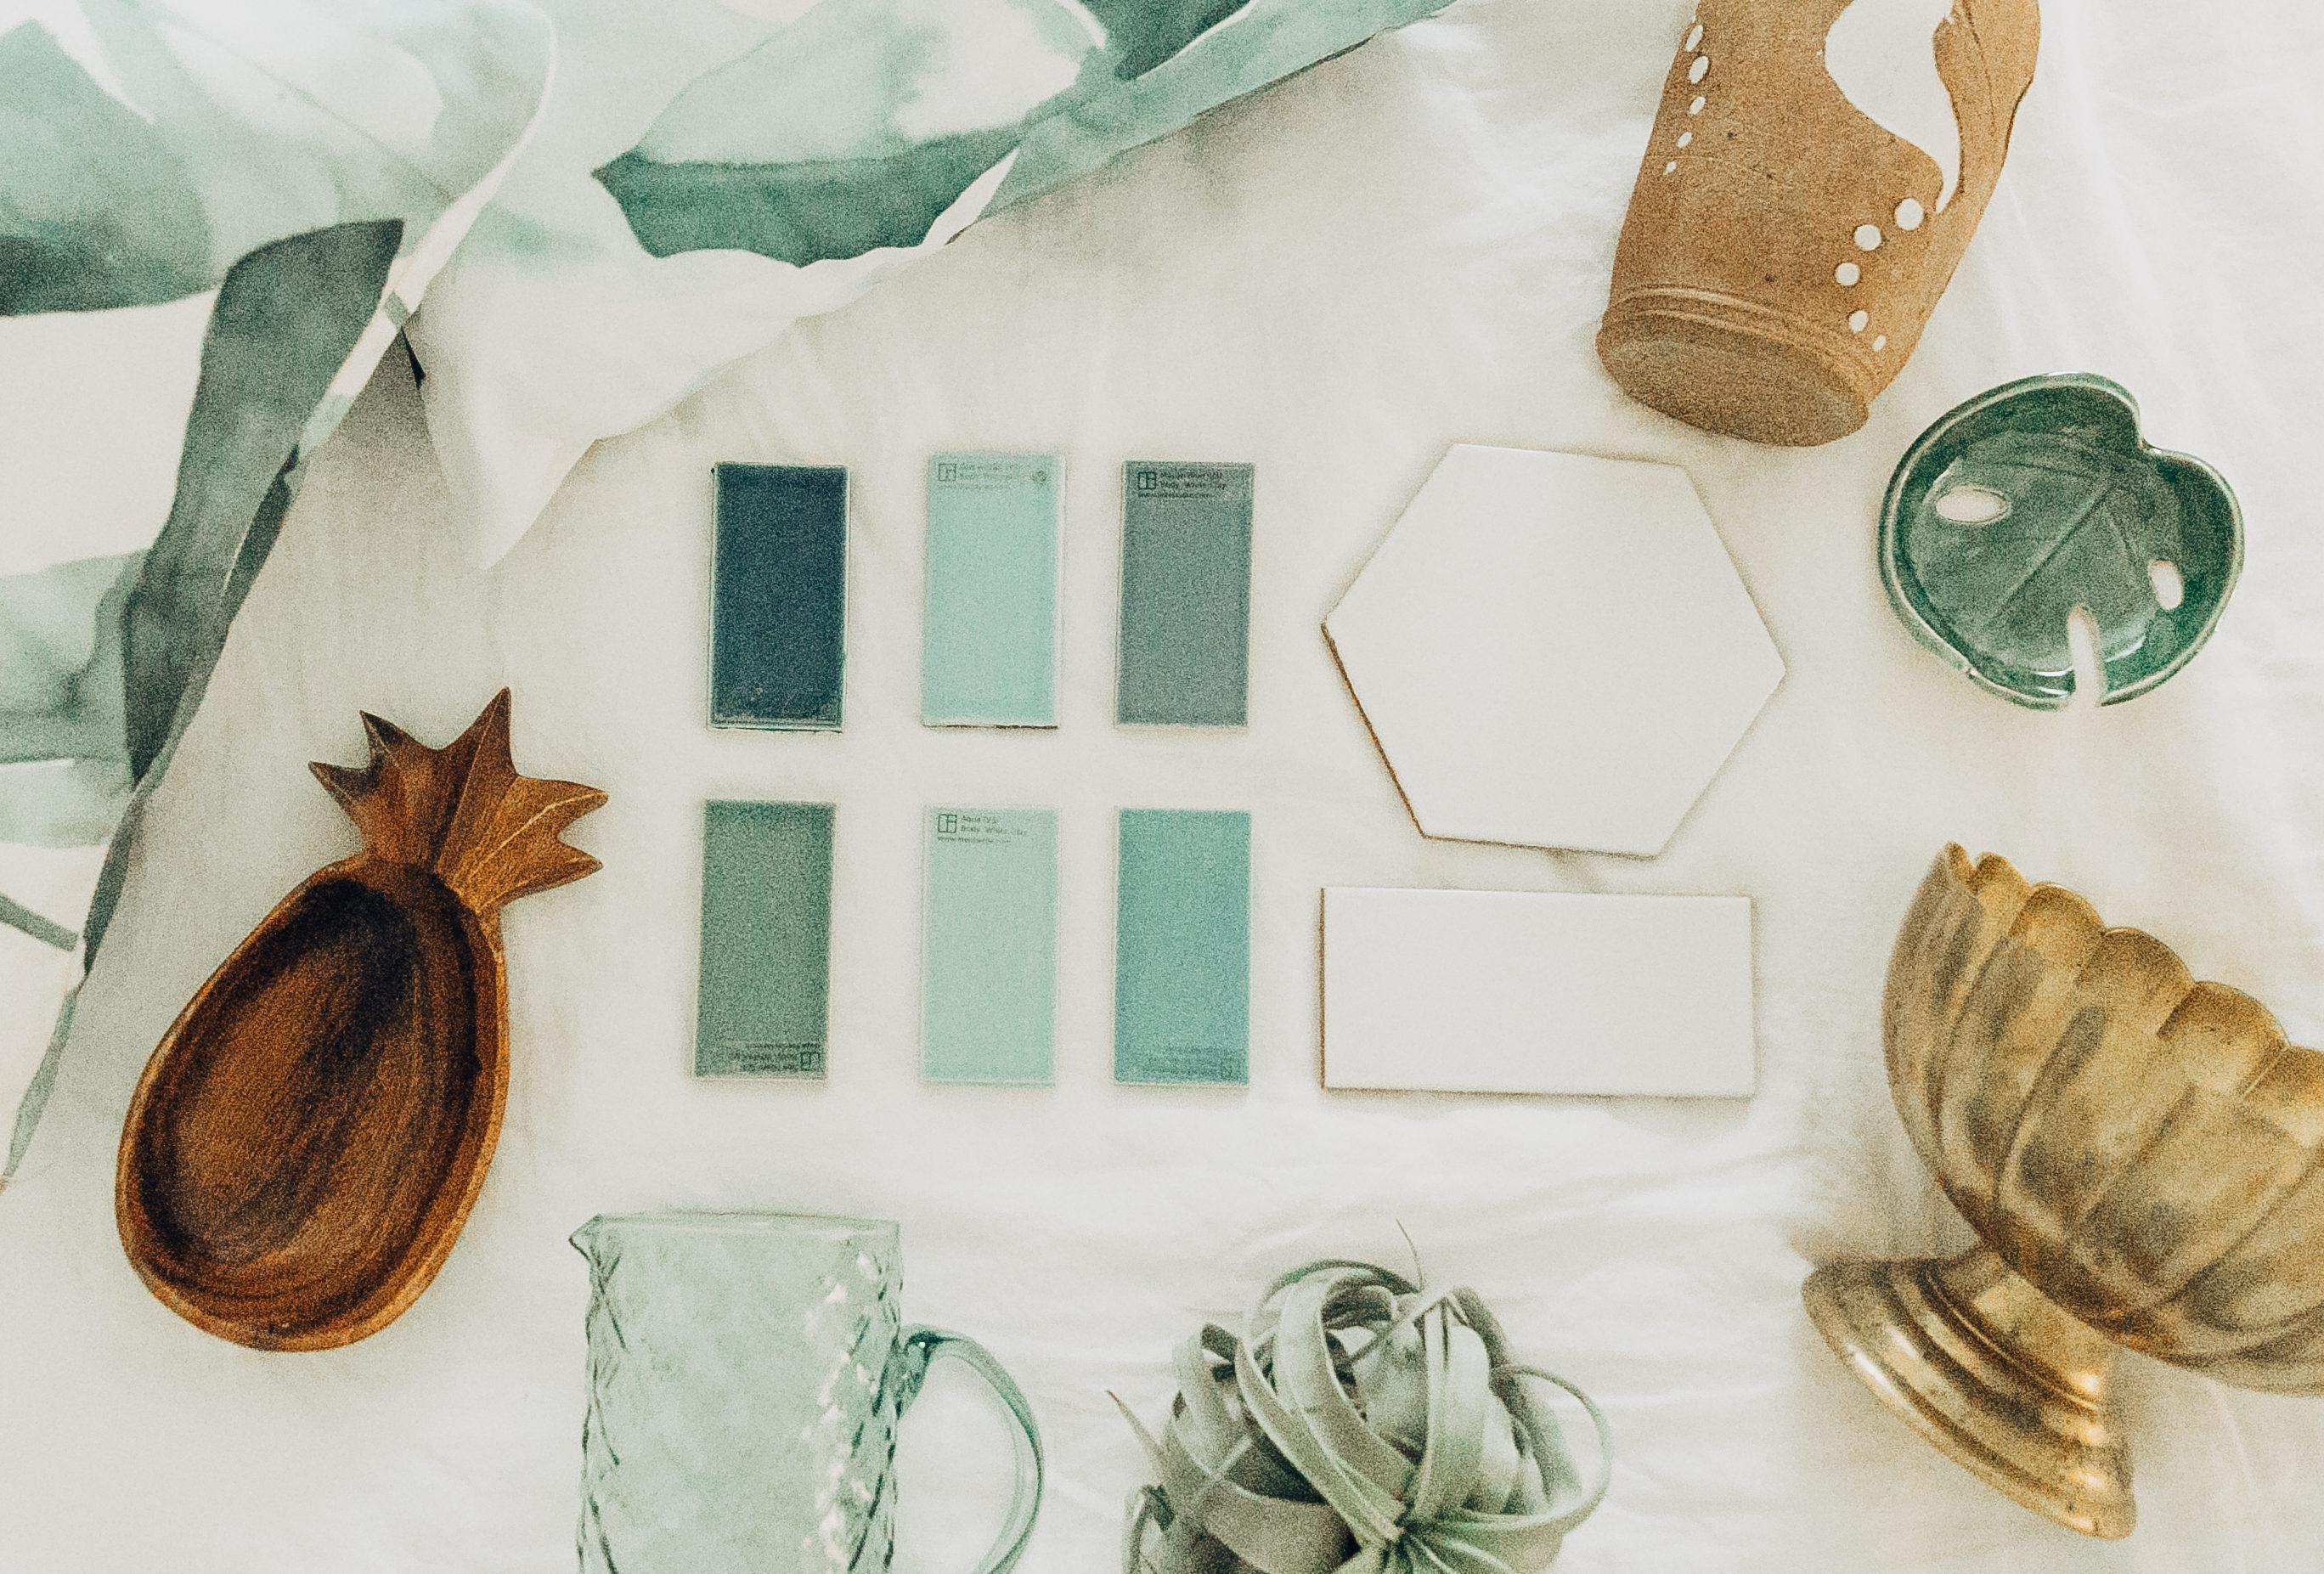 Fireclay Tile | Design Details | Design Scheme | Tropical Home Renovation | Home Redesign | Home Inspiration | Inspiration Board | Life Update from travel blogger ElanaLoo | Life in Hawaii via @elanaloo + elanaloo.com